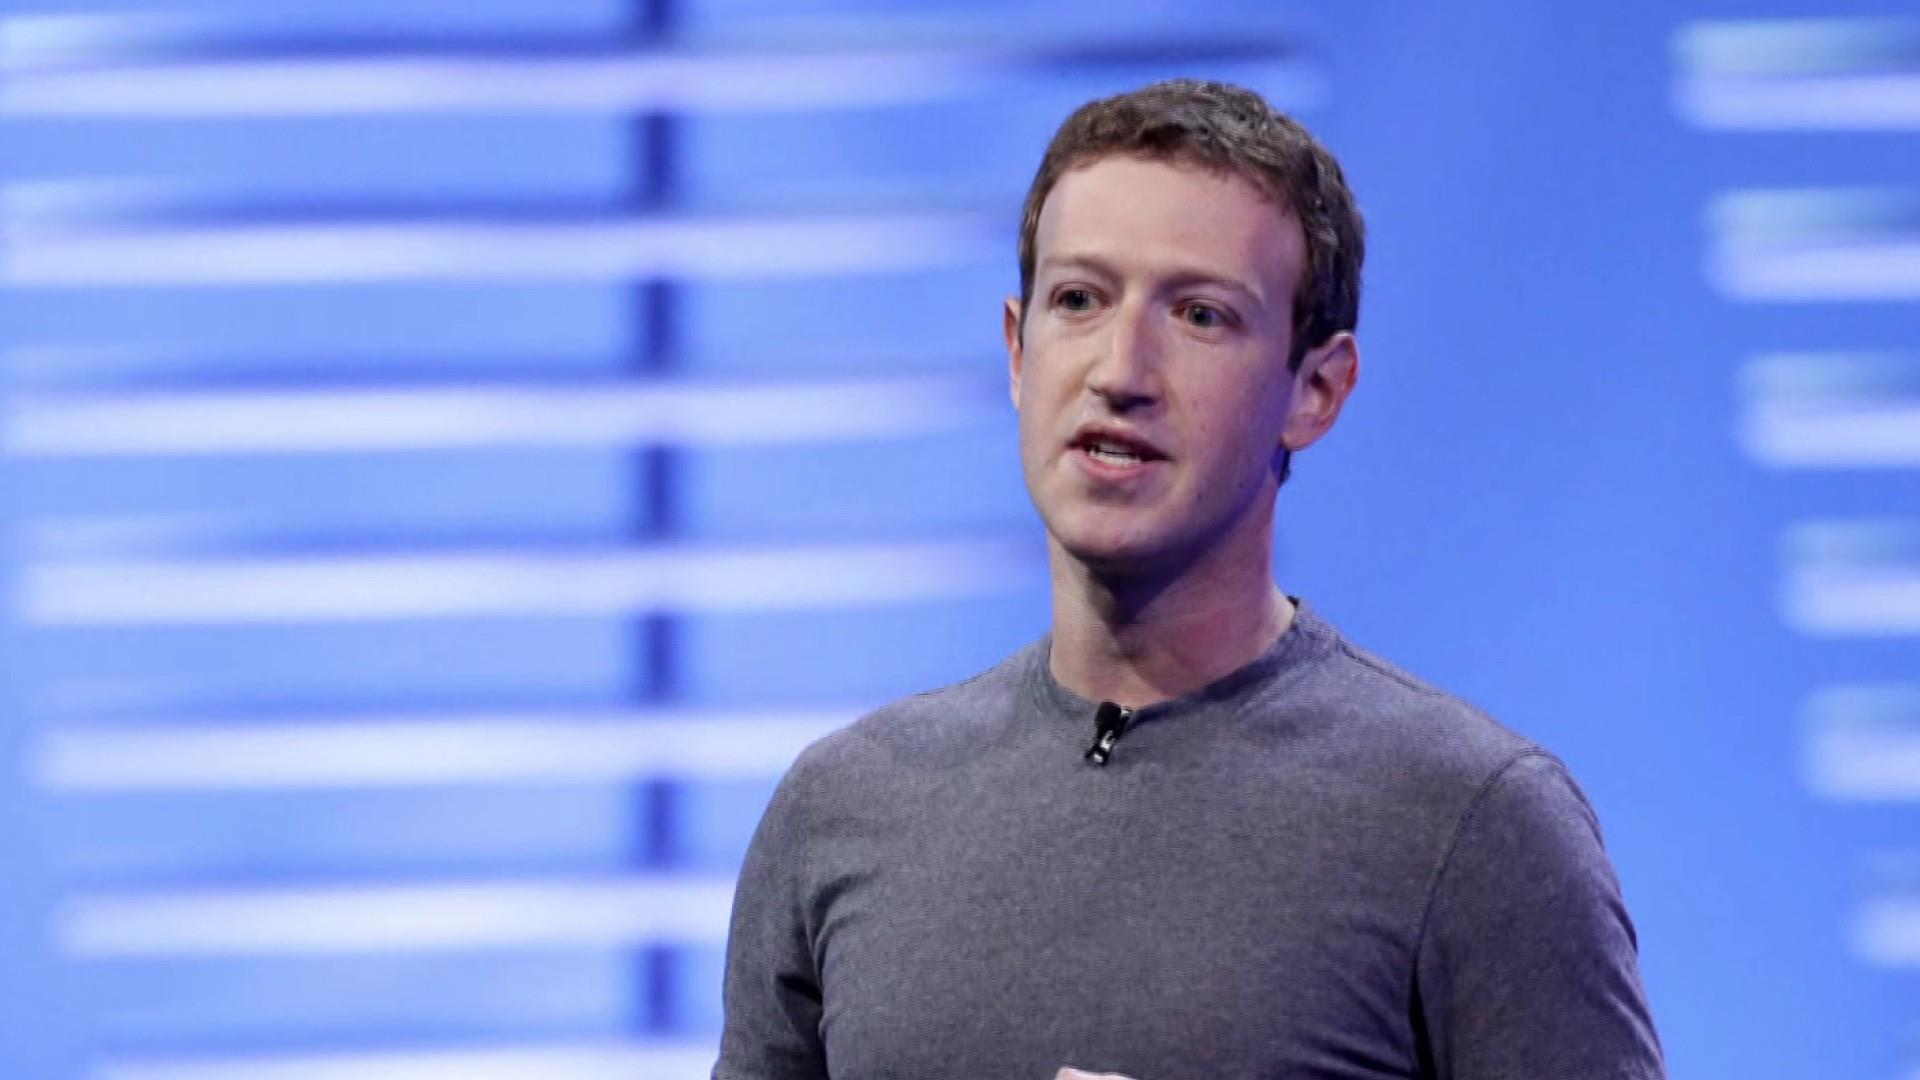 """Facebook's very comfortable censoring speech"""